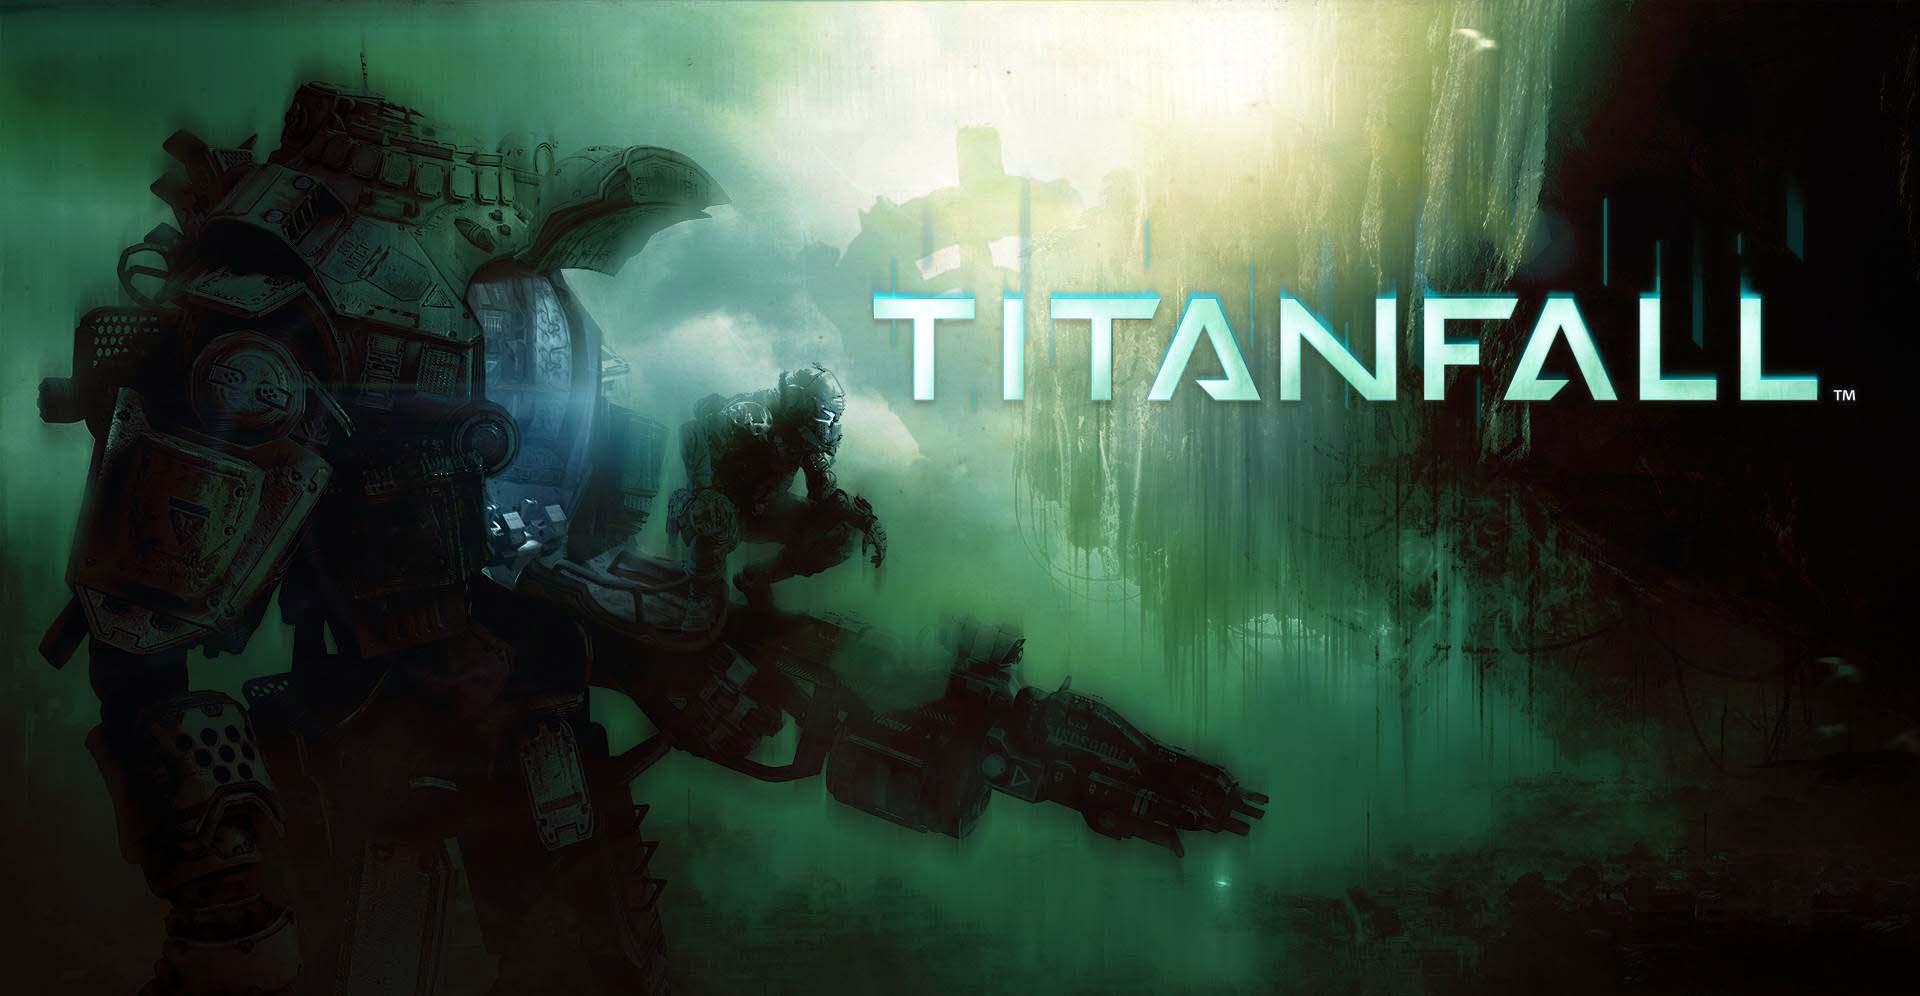 Imagenes De Fondo De Pantalla Para Xbox One , HD Wallpaper & Backgrounds